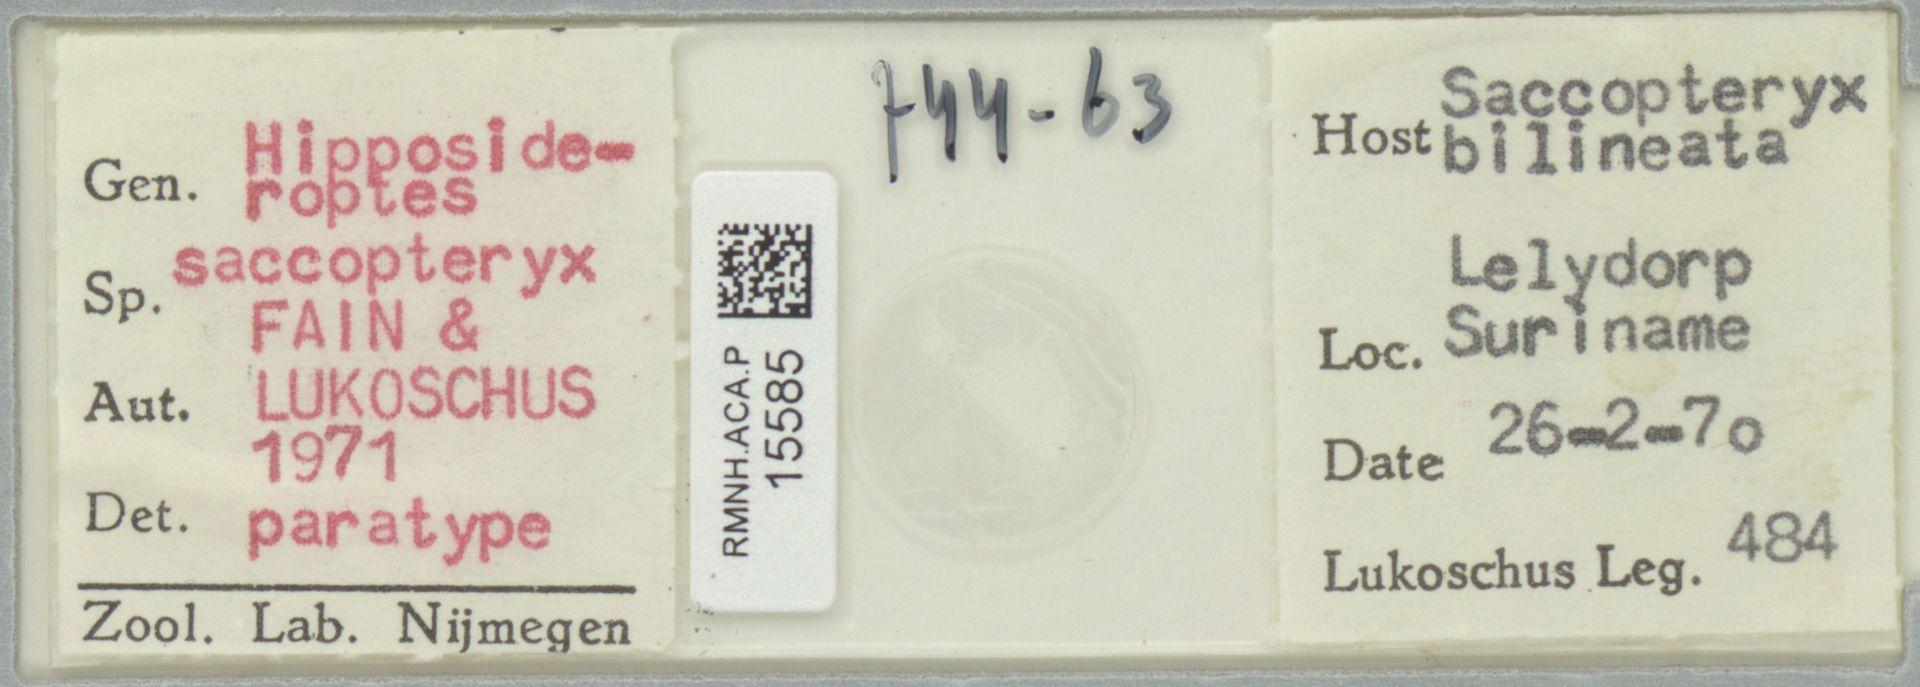 RMNH.ACA.P.15585 | Hipposideroptes saccopteryx